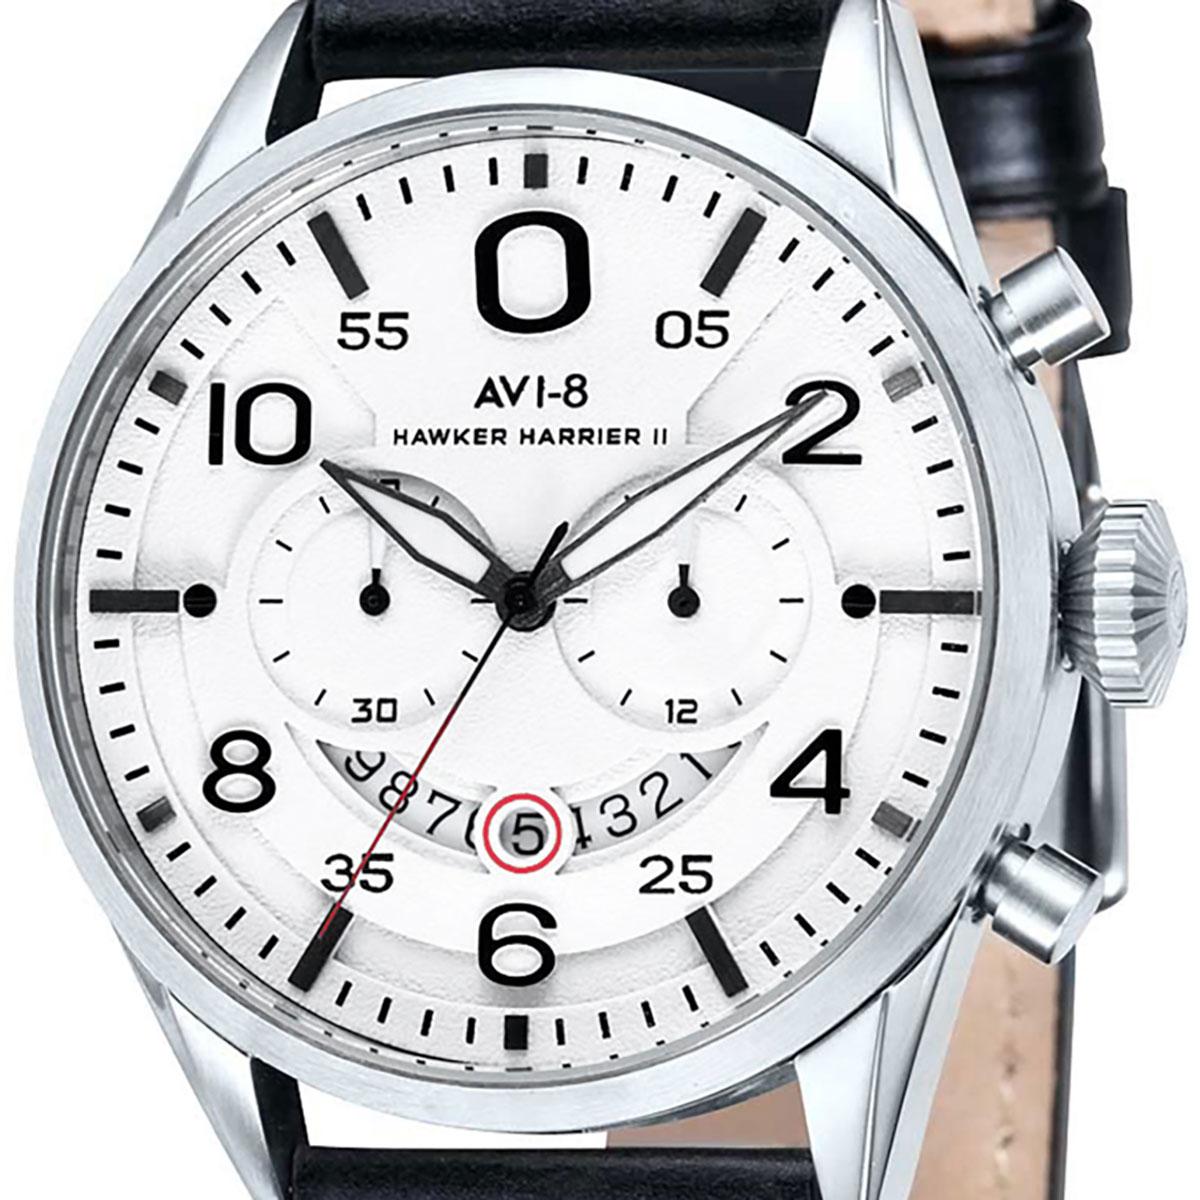 AVI-8 アヴィエイト 電池式クォーツ 腕時計 [AV-4031-01] 並行輸入品  デイト クロノグラフ